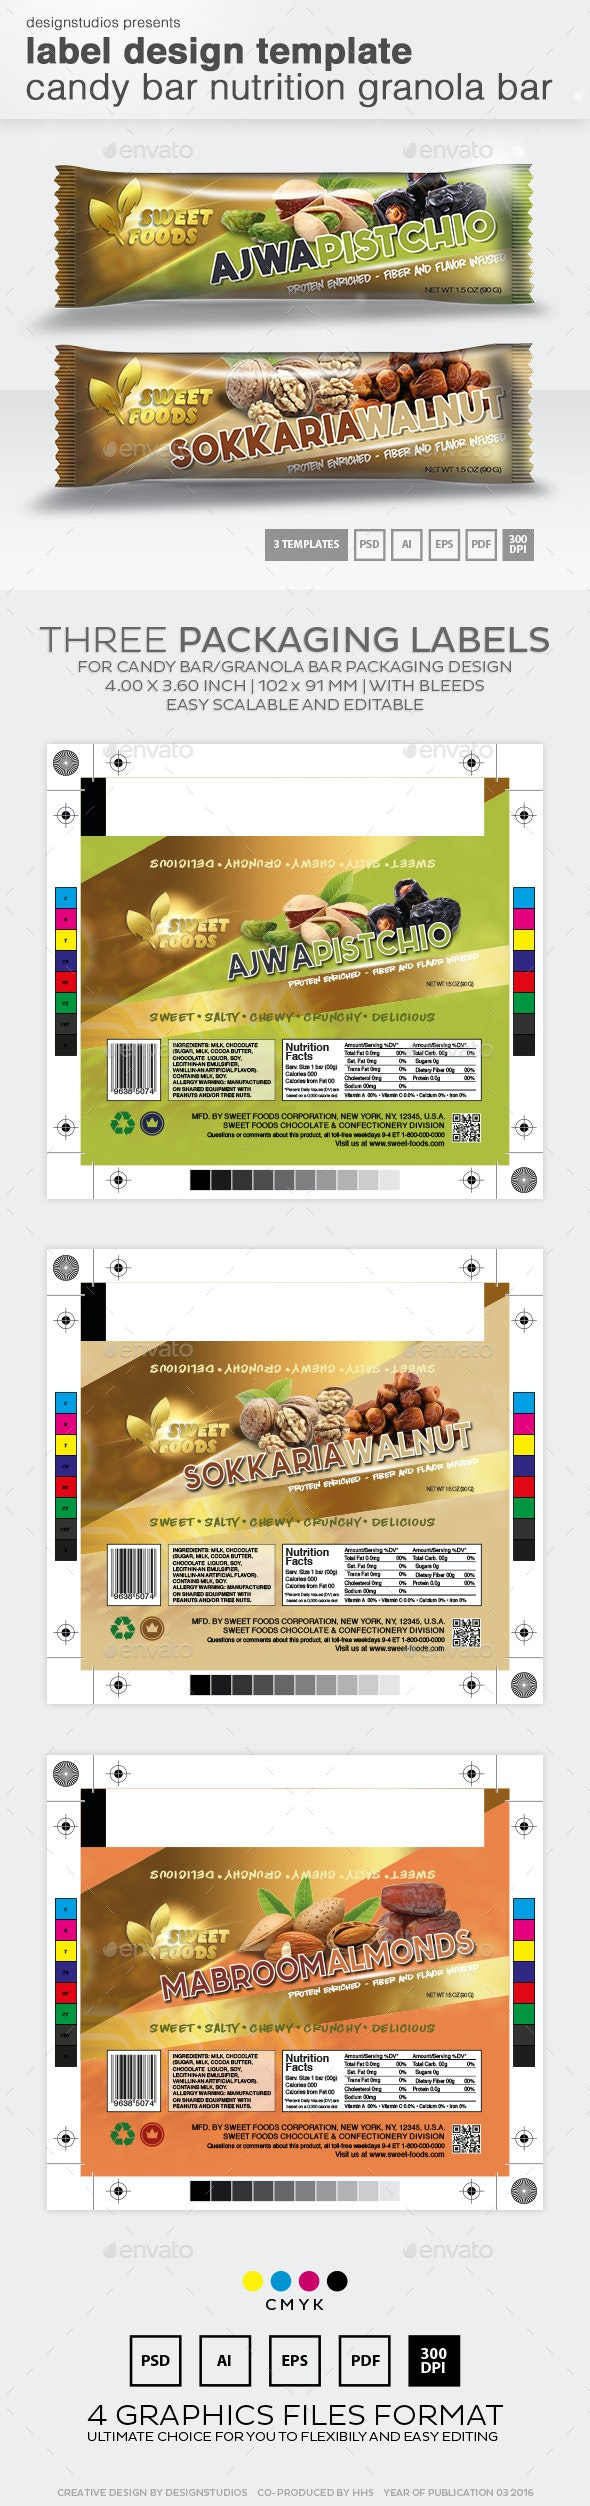 Label Design Template Candy Bar Nutrition Granola Bar - Packaging Print Templates